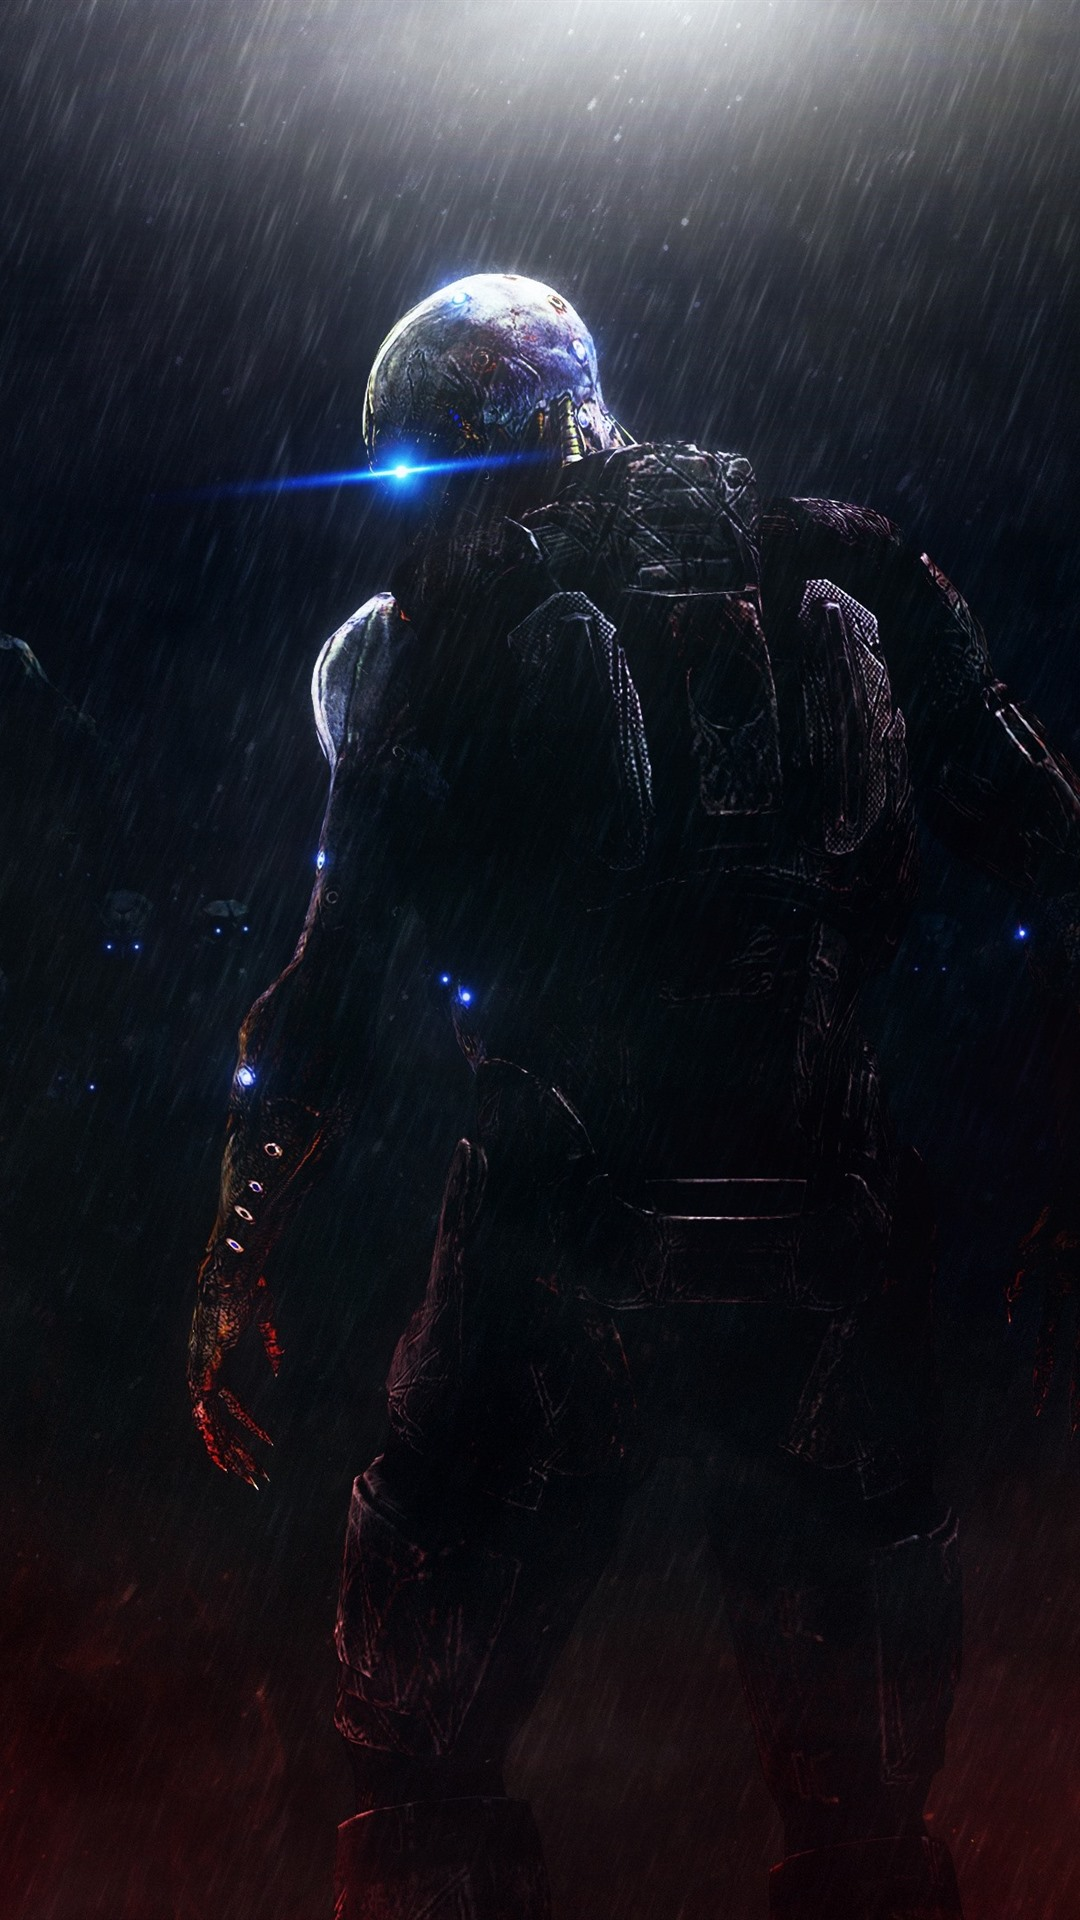 Monster Rain Night Mass Effect 1080x1920 Iphone 8 7 6 6s